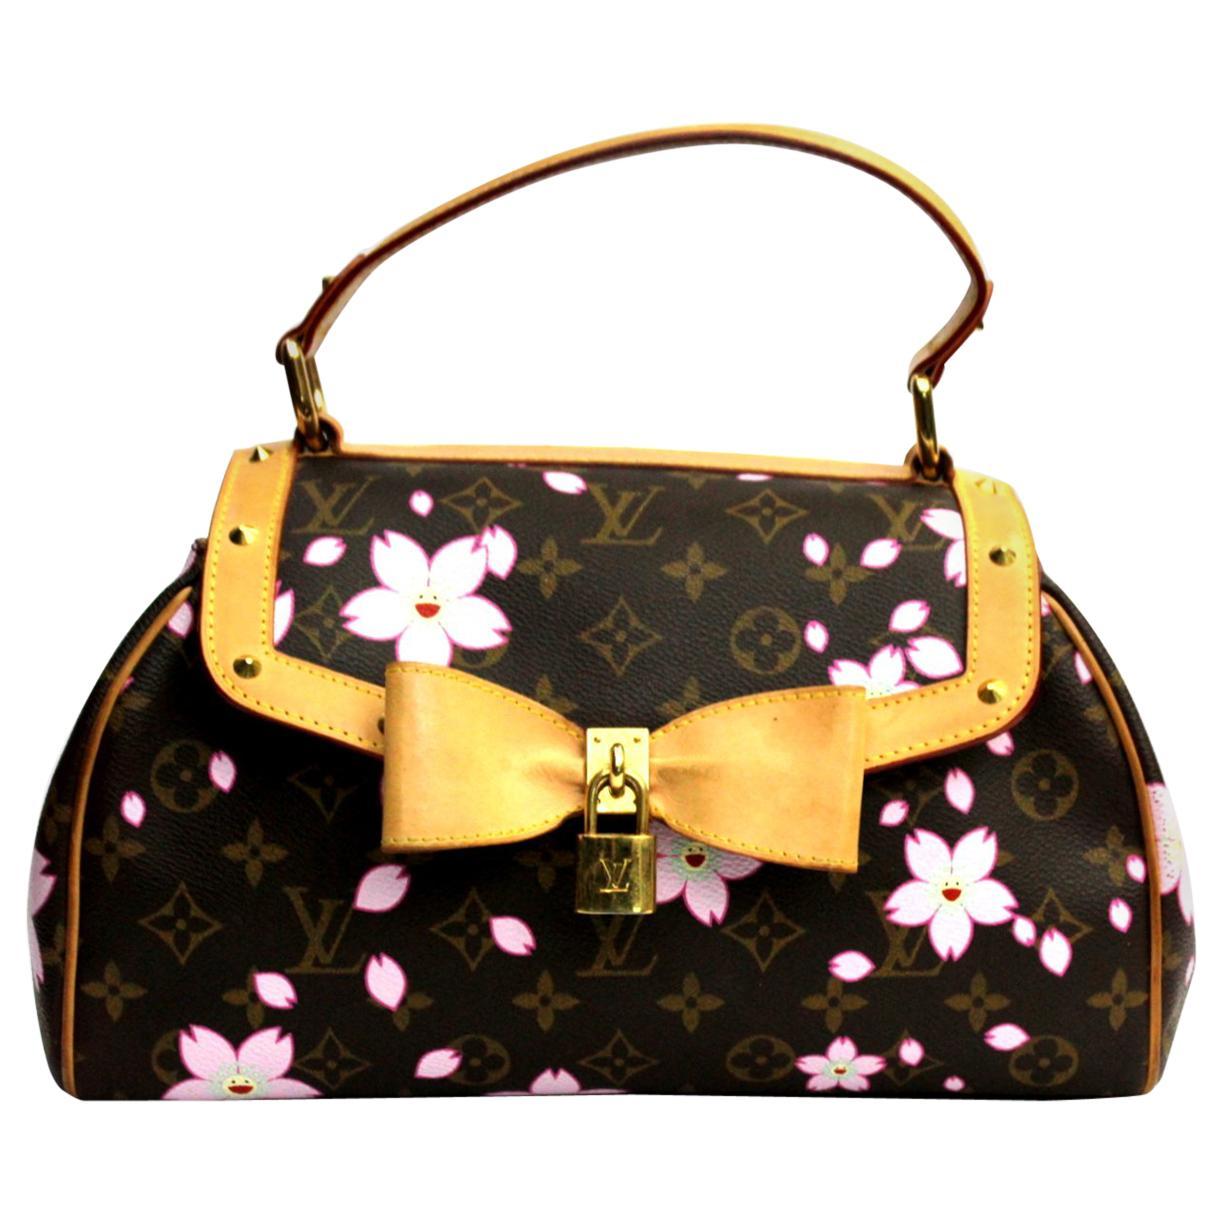 LOUIS VUITTON X TAKASHI MURAKAMI Cherry Blossom Bag